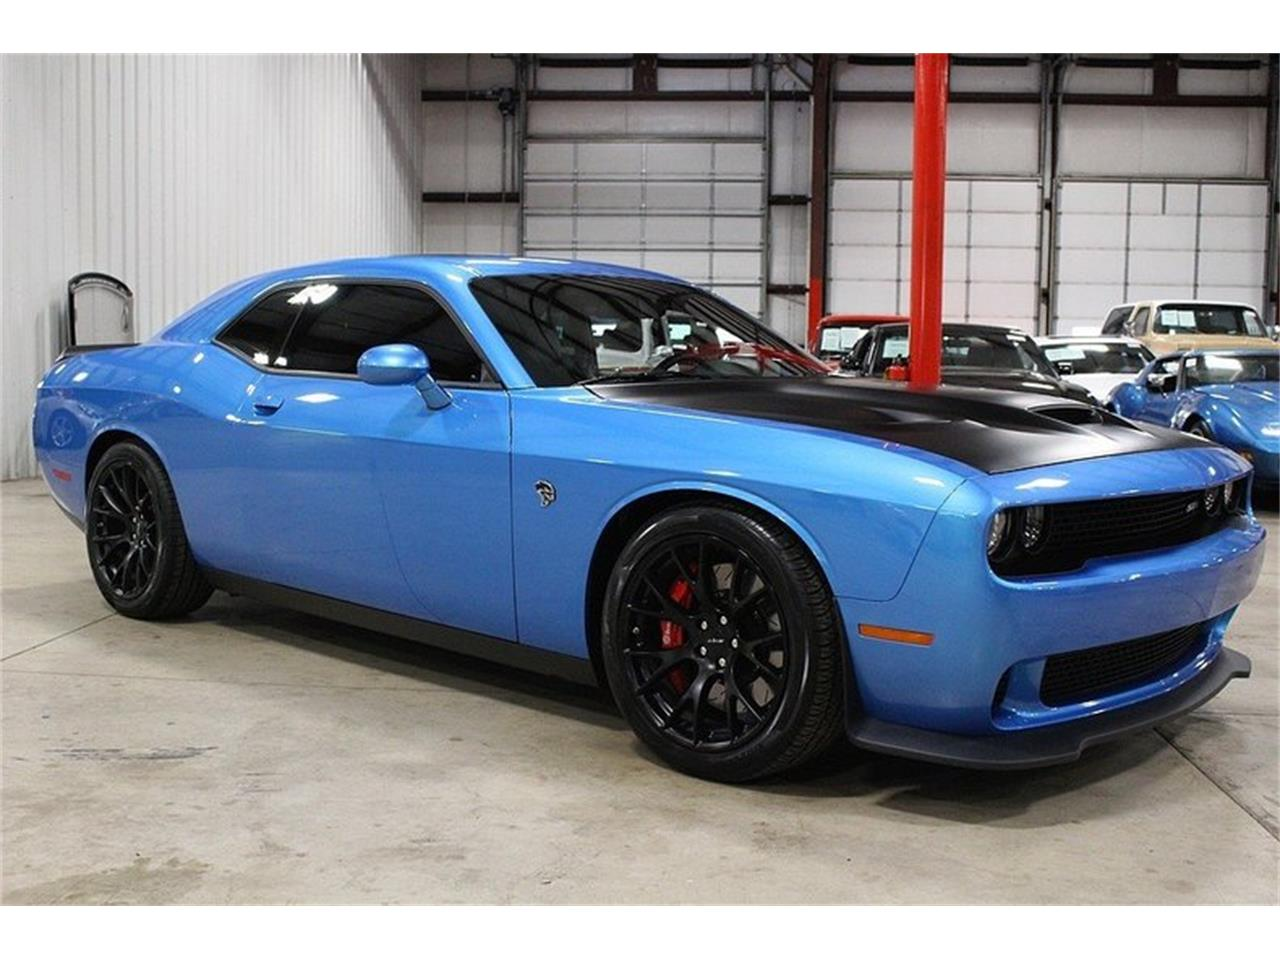 dodge hellcat for sale in florida 2016 Dodge Challenger SRT Hellcat for Sale  ClassicCars